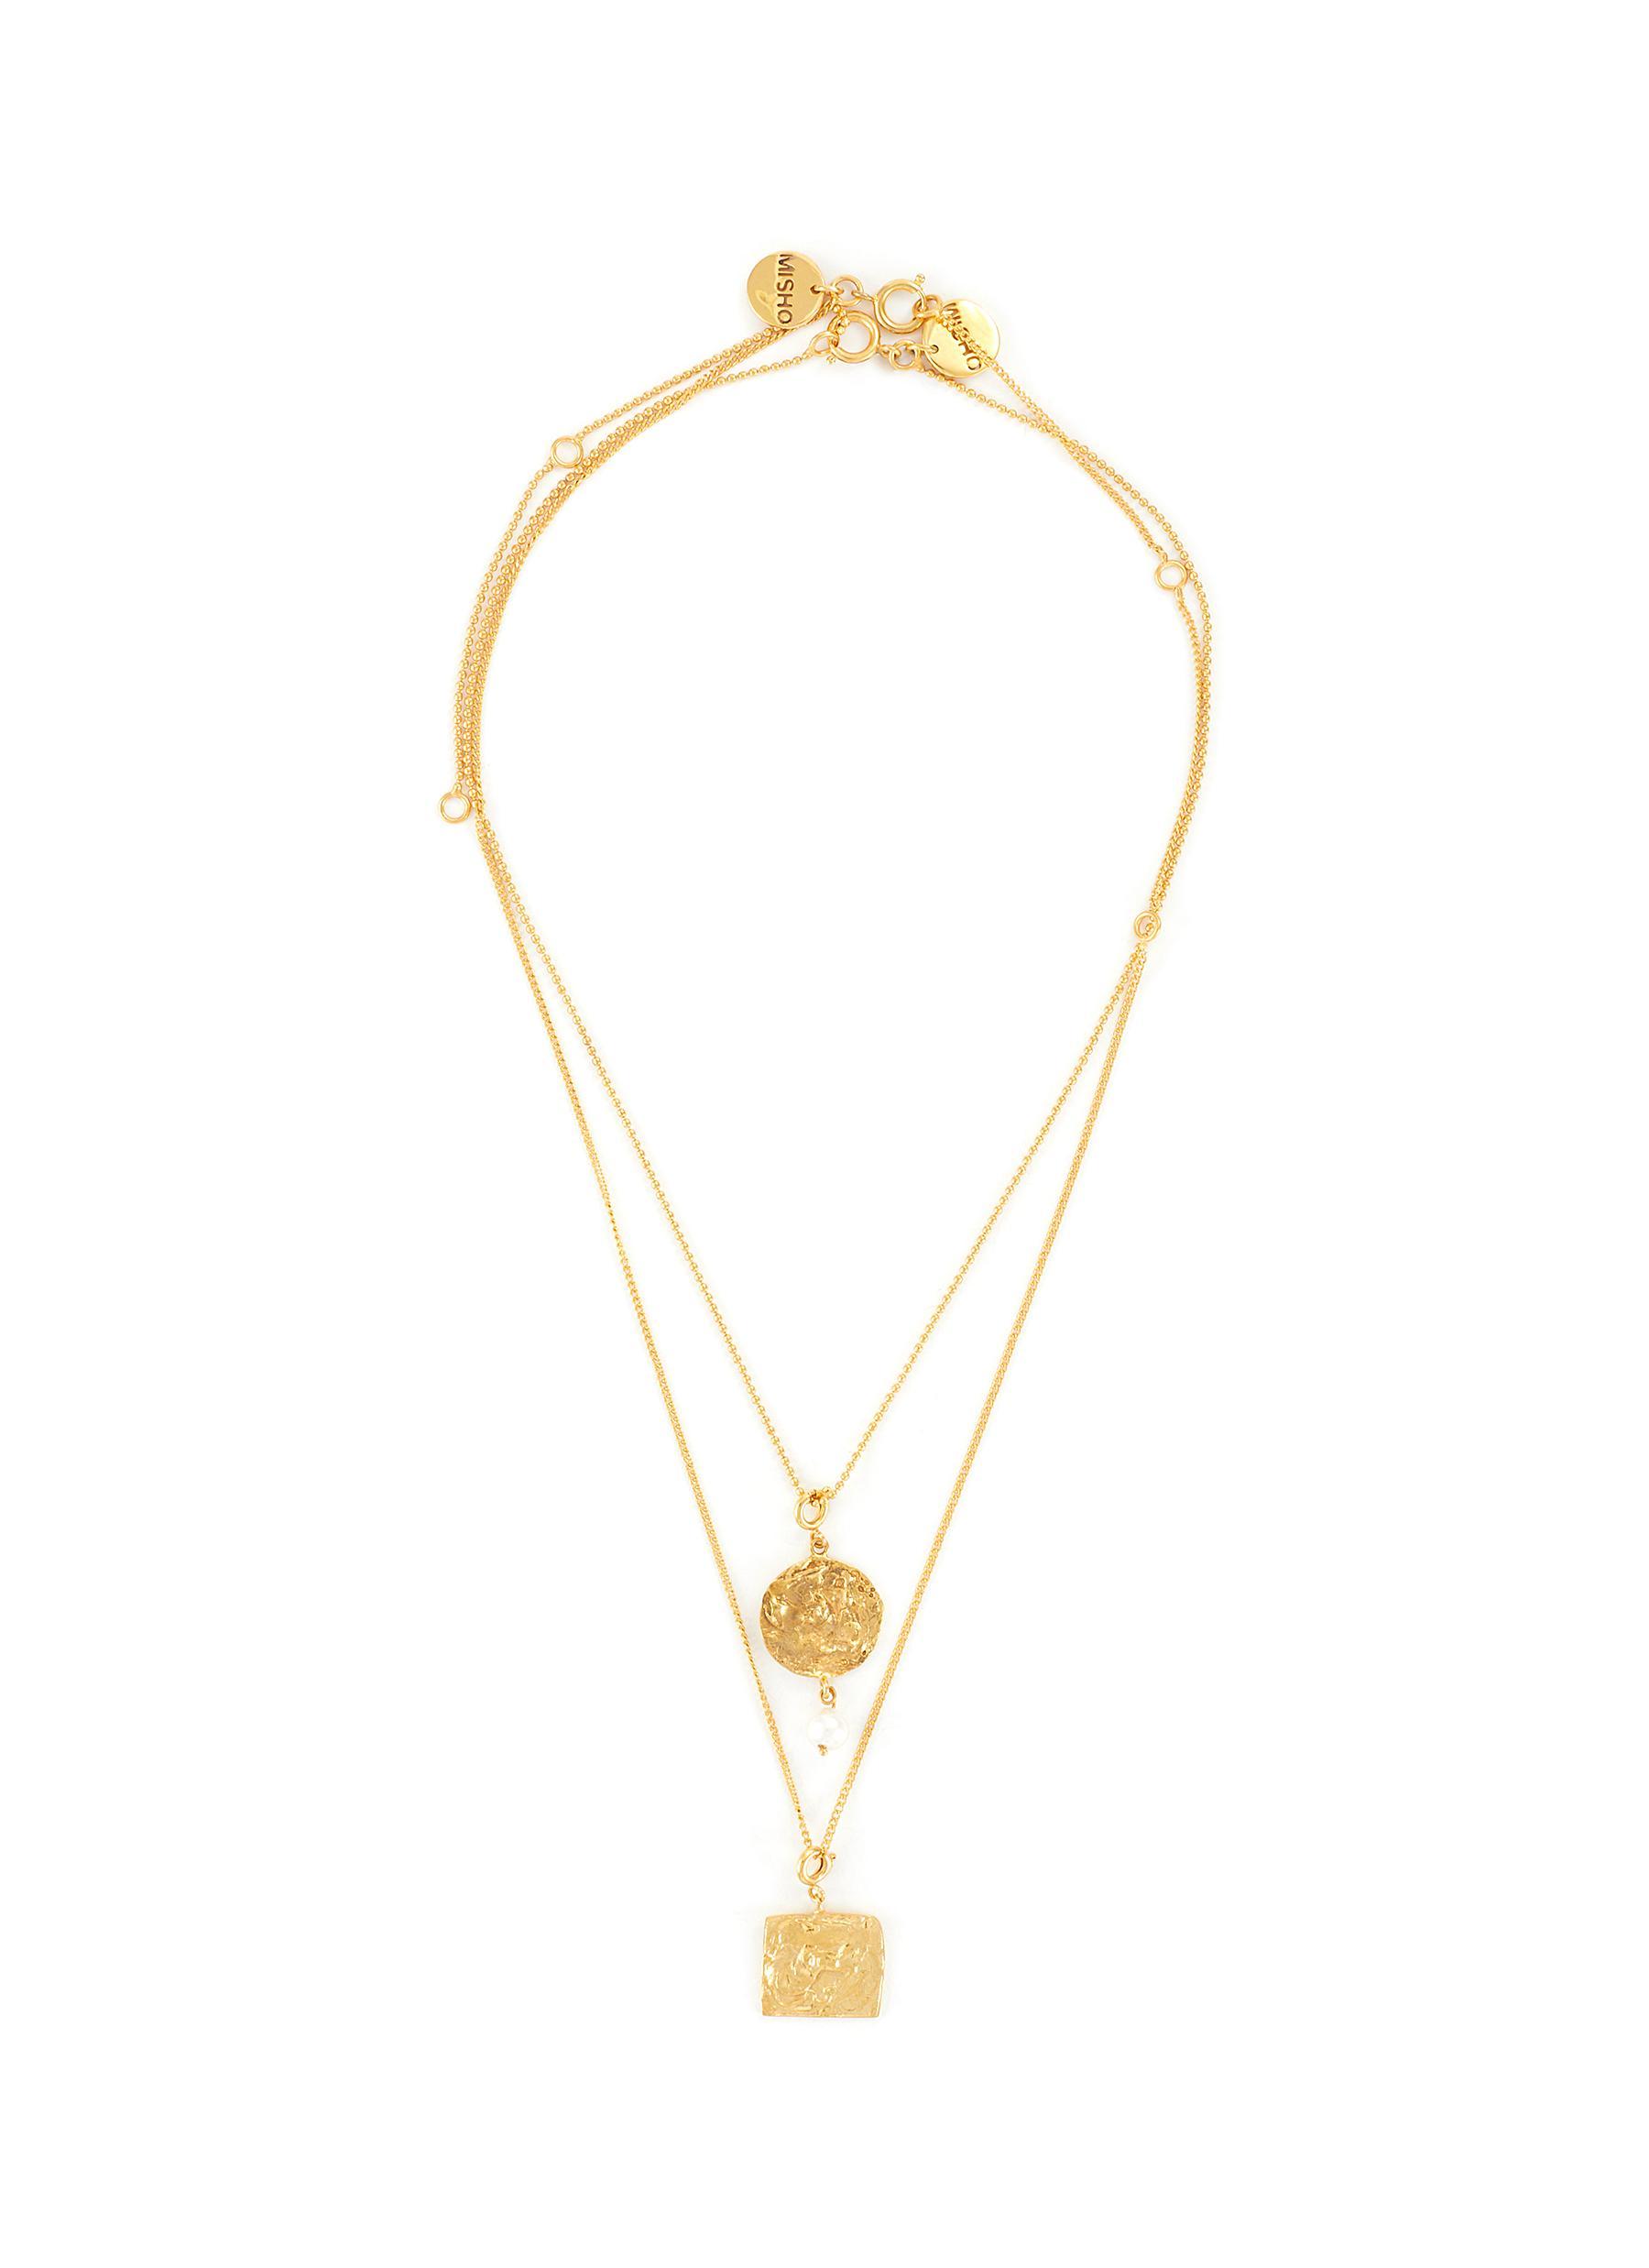 22k Gold-plated Bronze Pendant Necklace Set